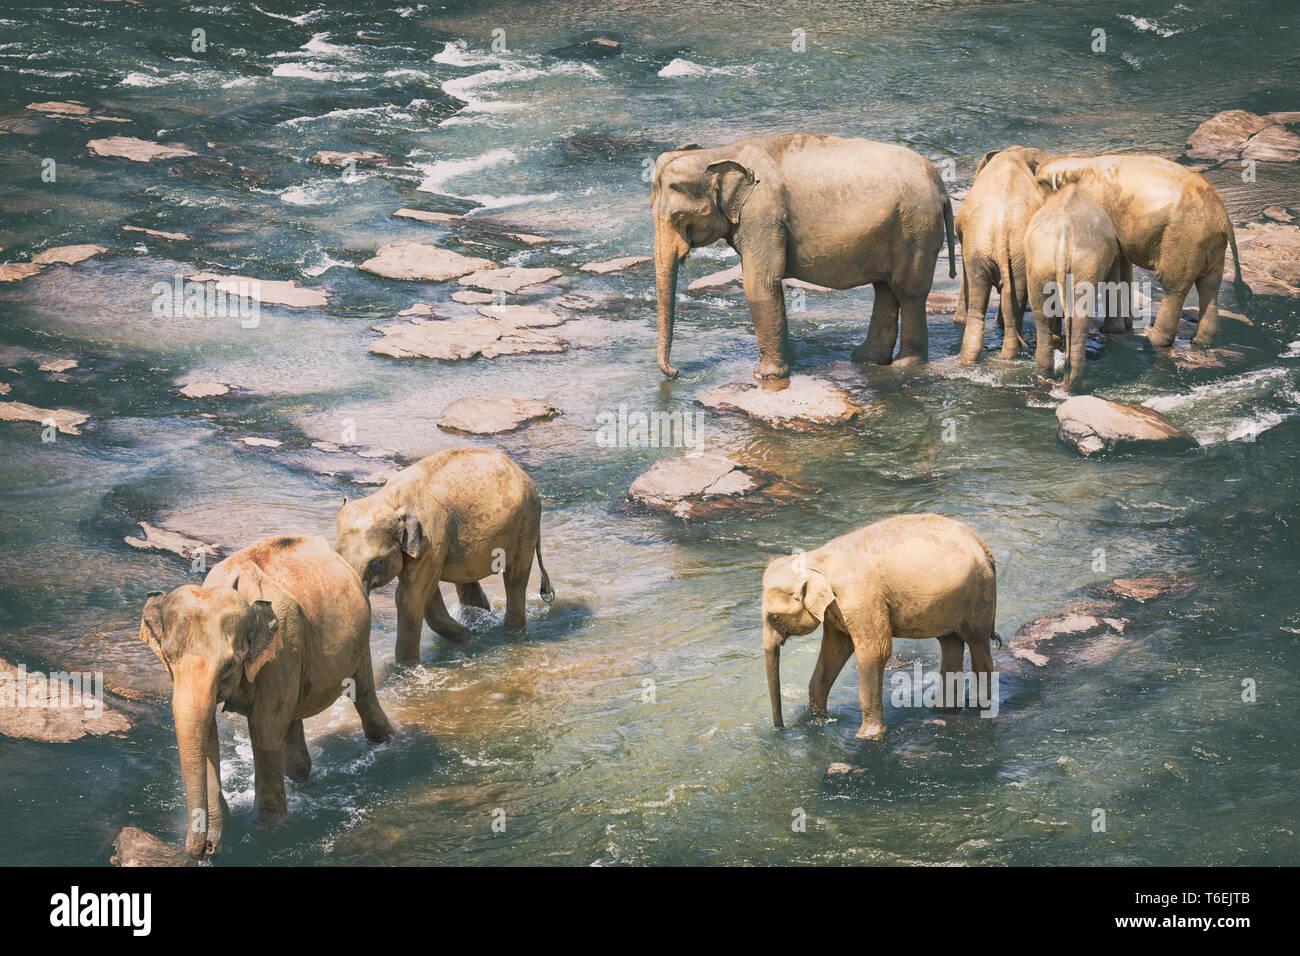 Elephants bathing in a river Stock Photo